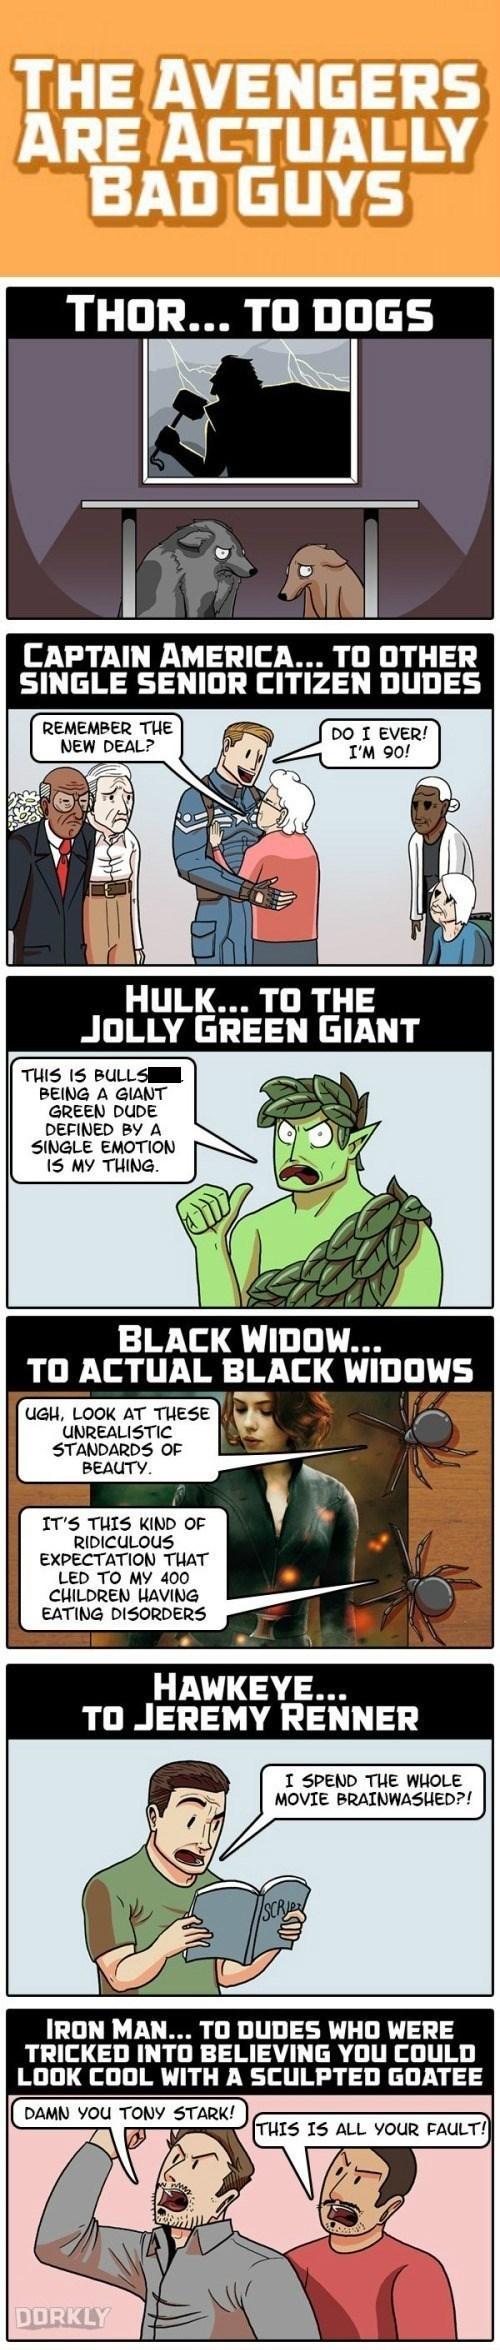 The Avengers Aren't Actually Good Guys